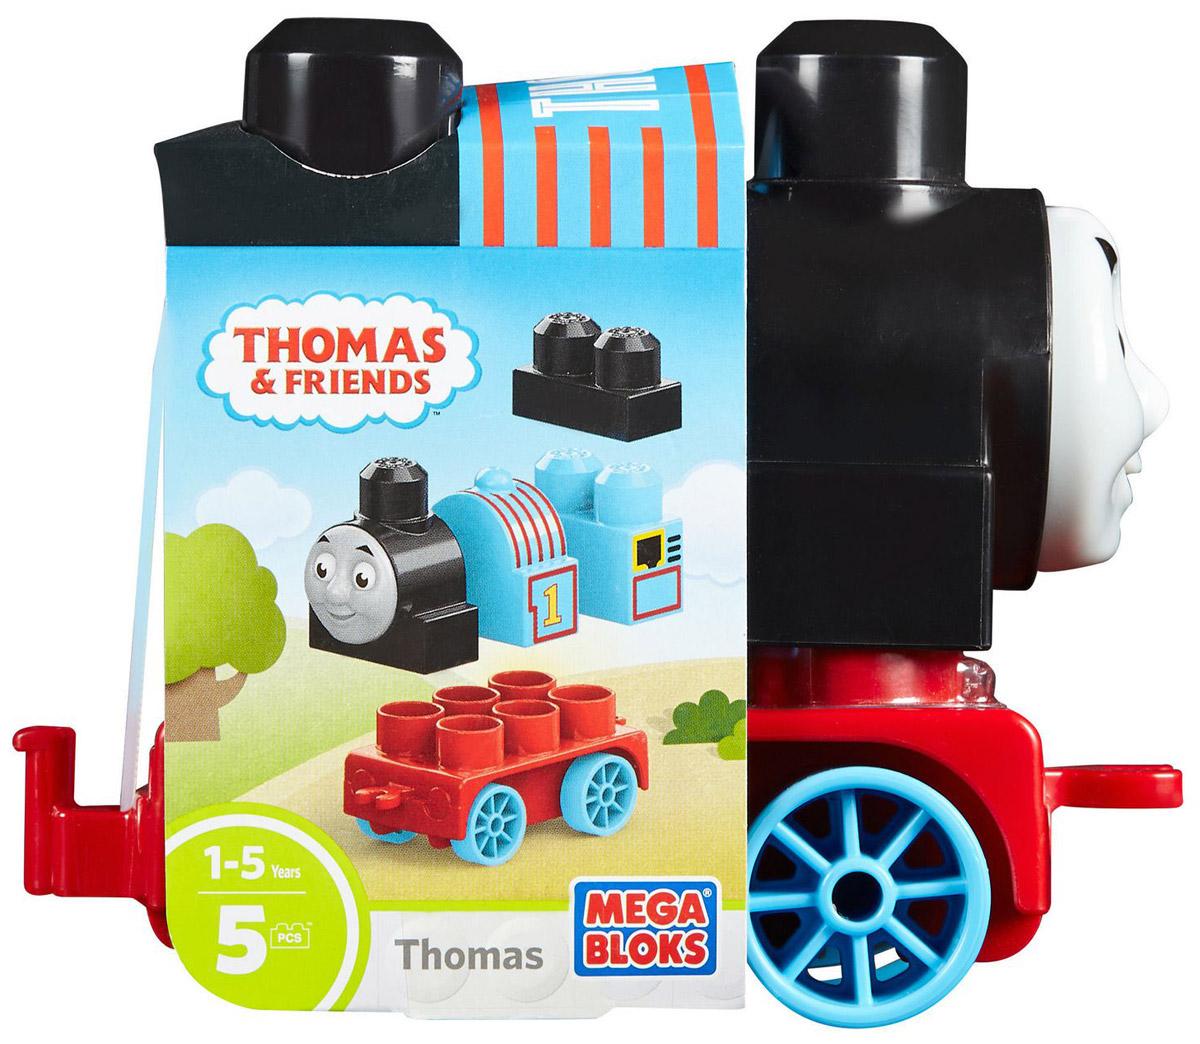 Mega Bloks Thomas & Friends Конструктор Паровозик Томас конструкторы mega bloks томас и друзья томас и гарольд